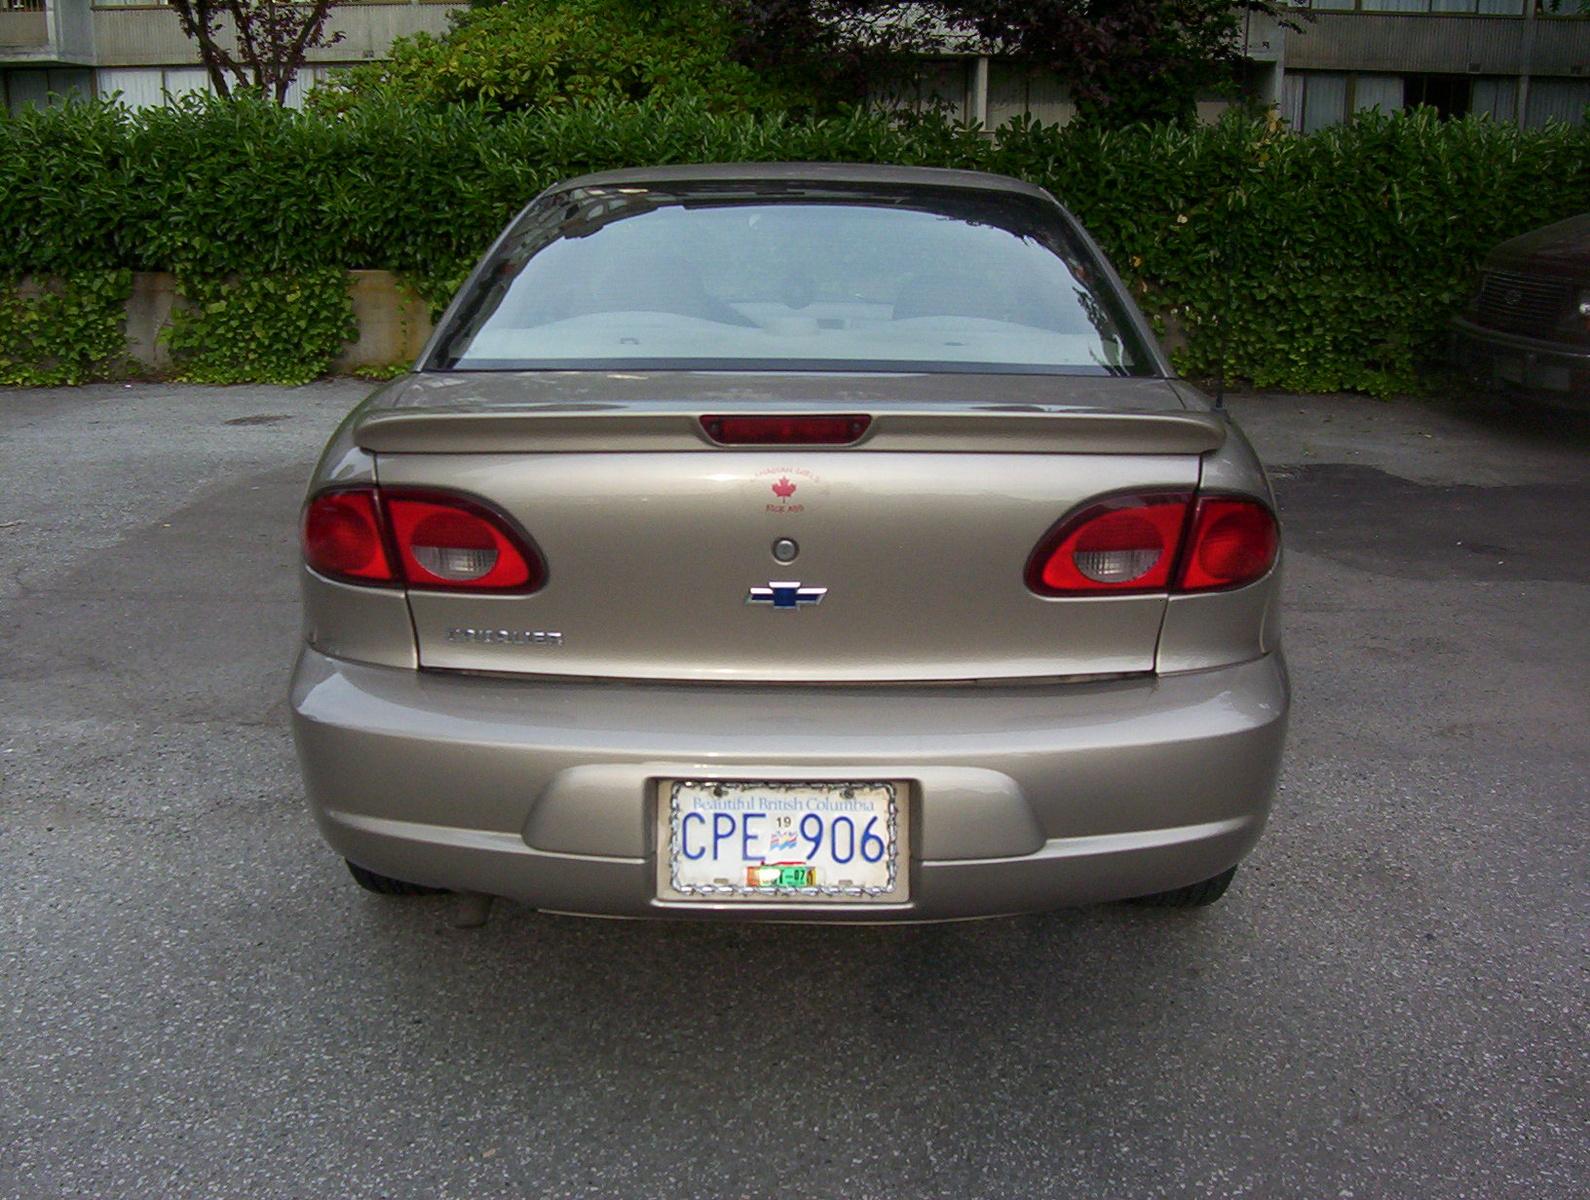 Chevrolet Cavalier Pic